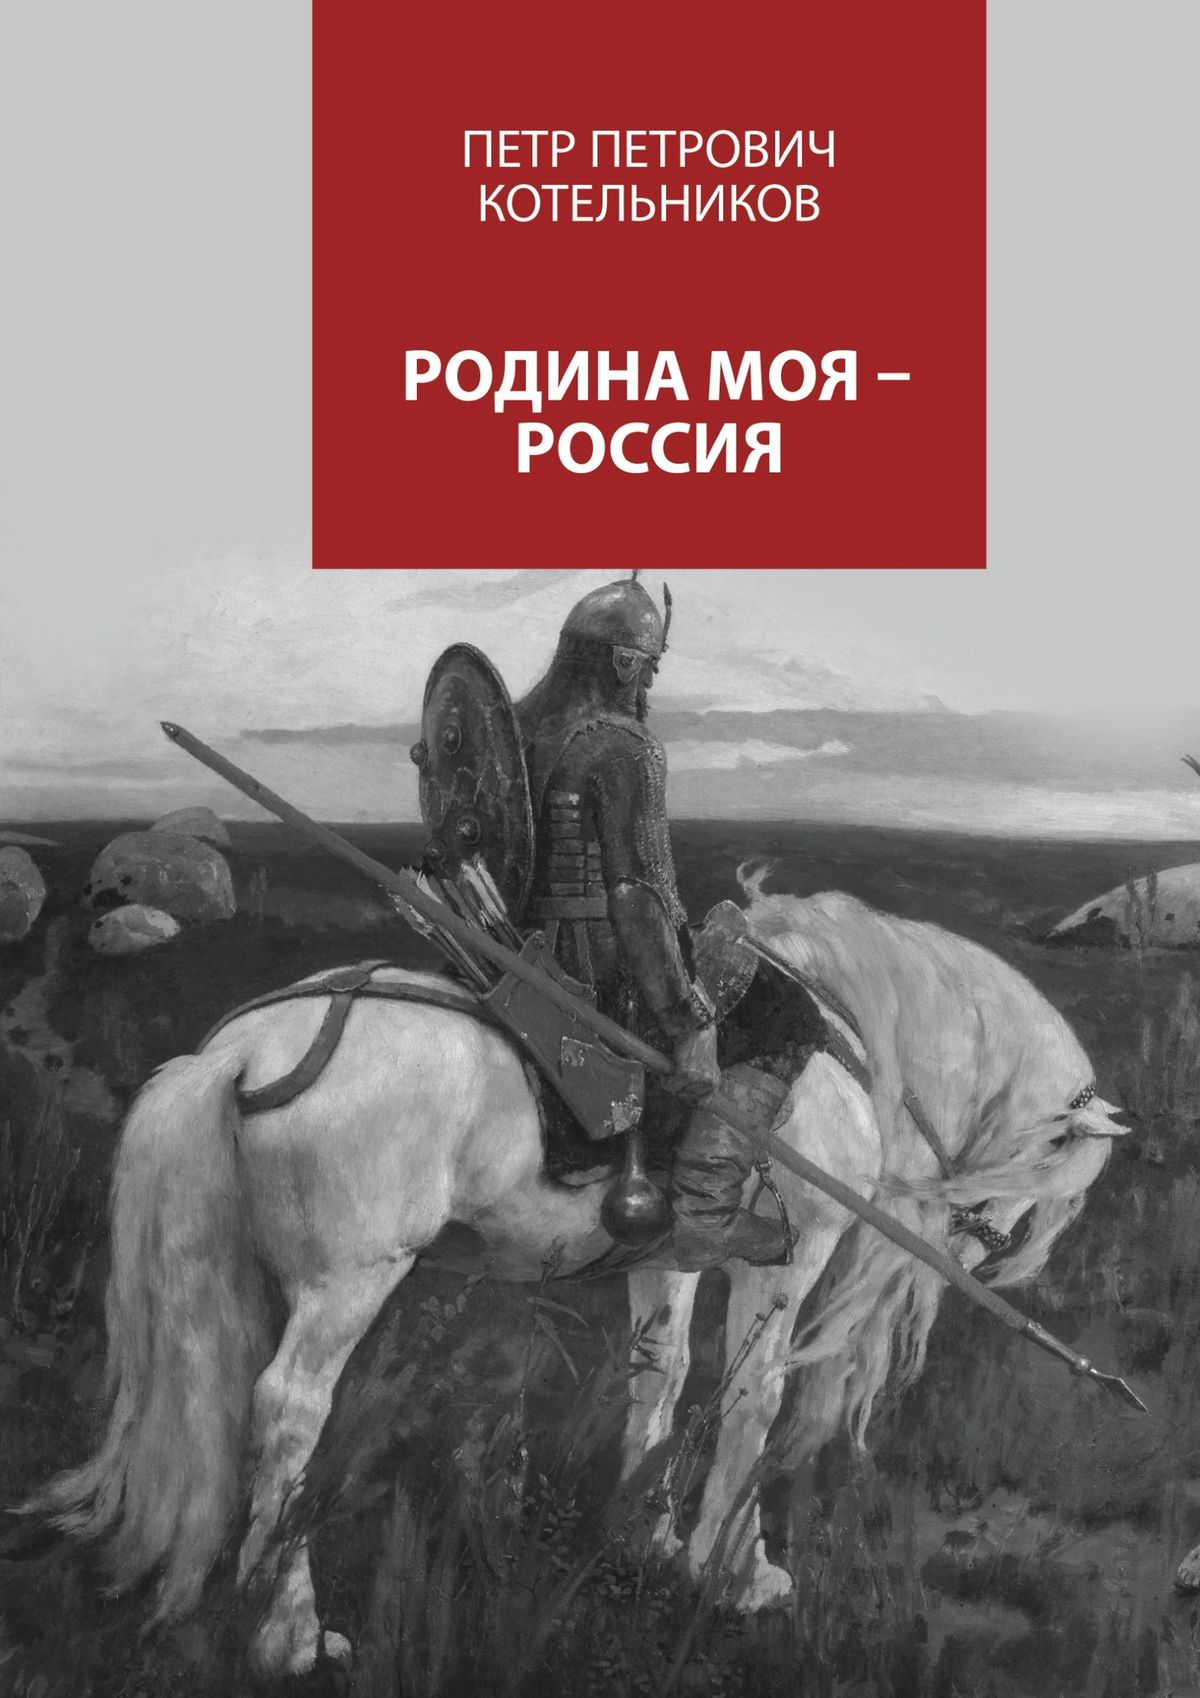 цена Петр Петрович Котельников Родина моя – Россия